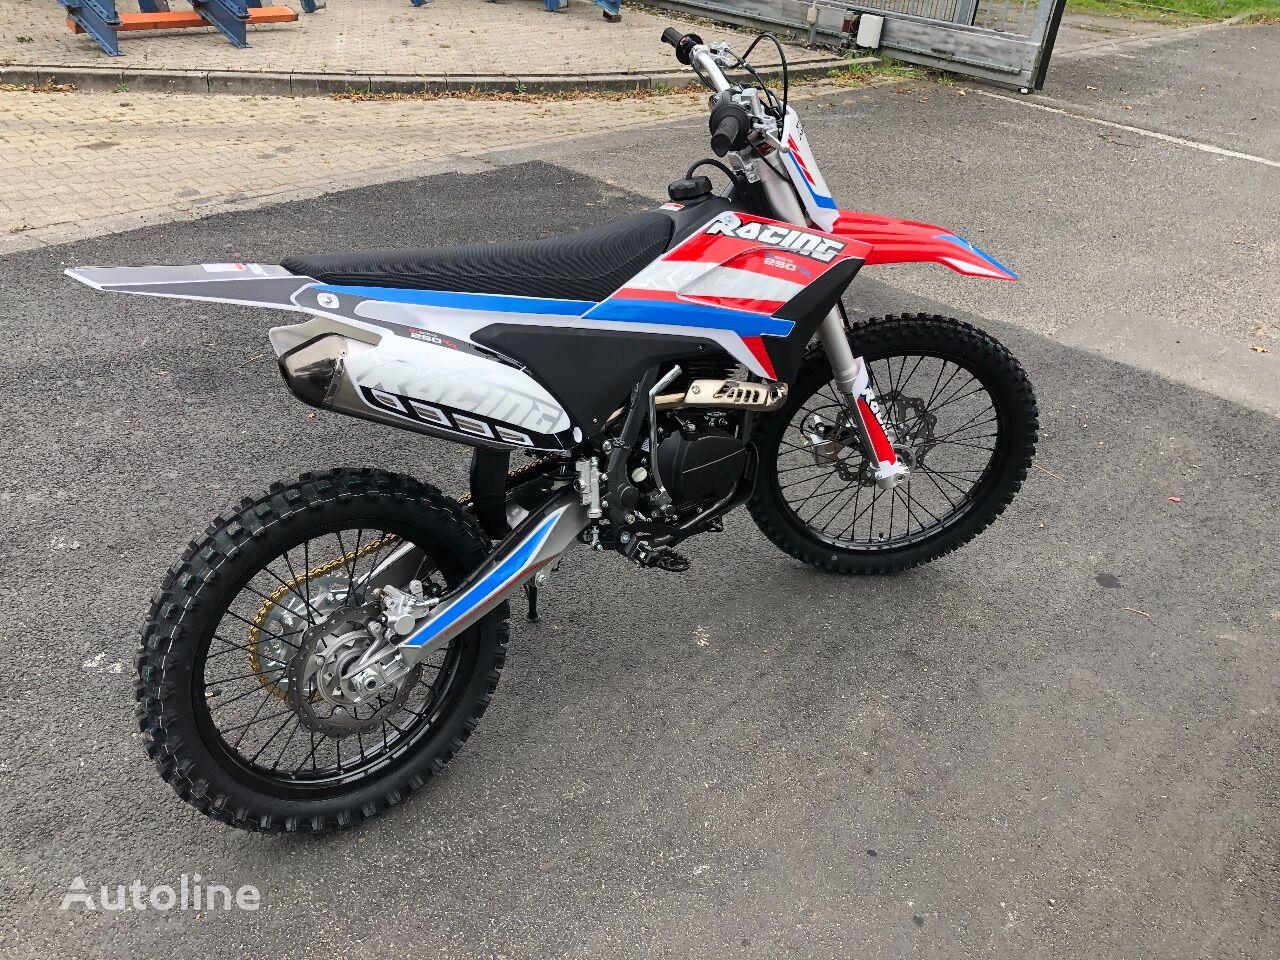 new Cross Motorrad - Apollo AGB-40-1 motorbike